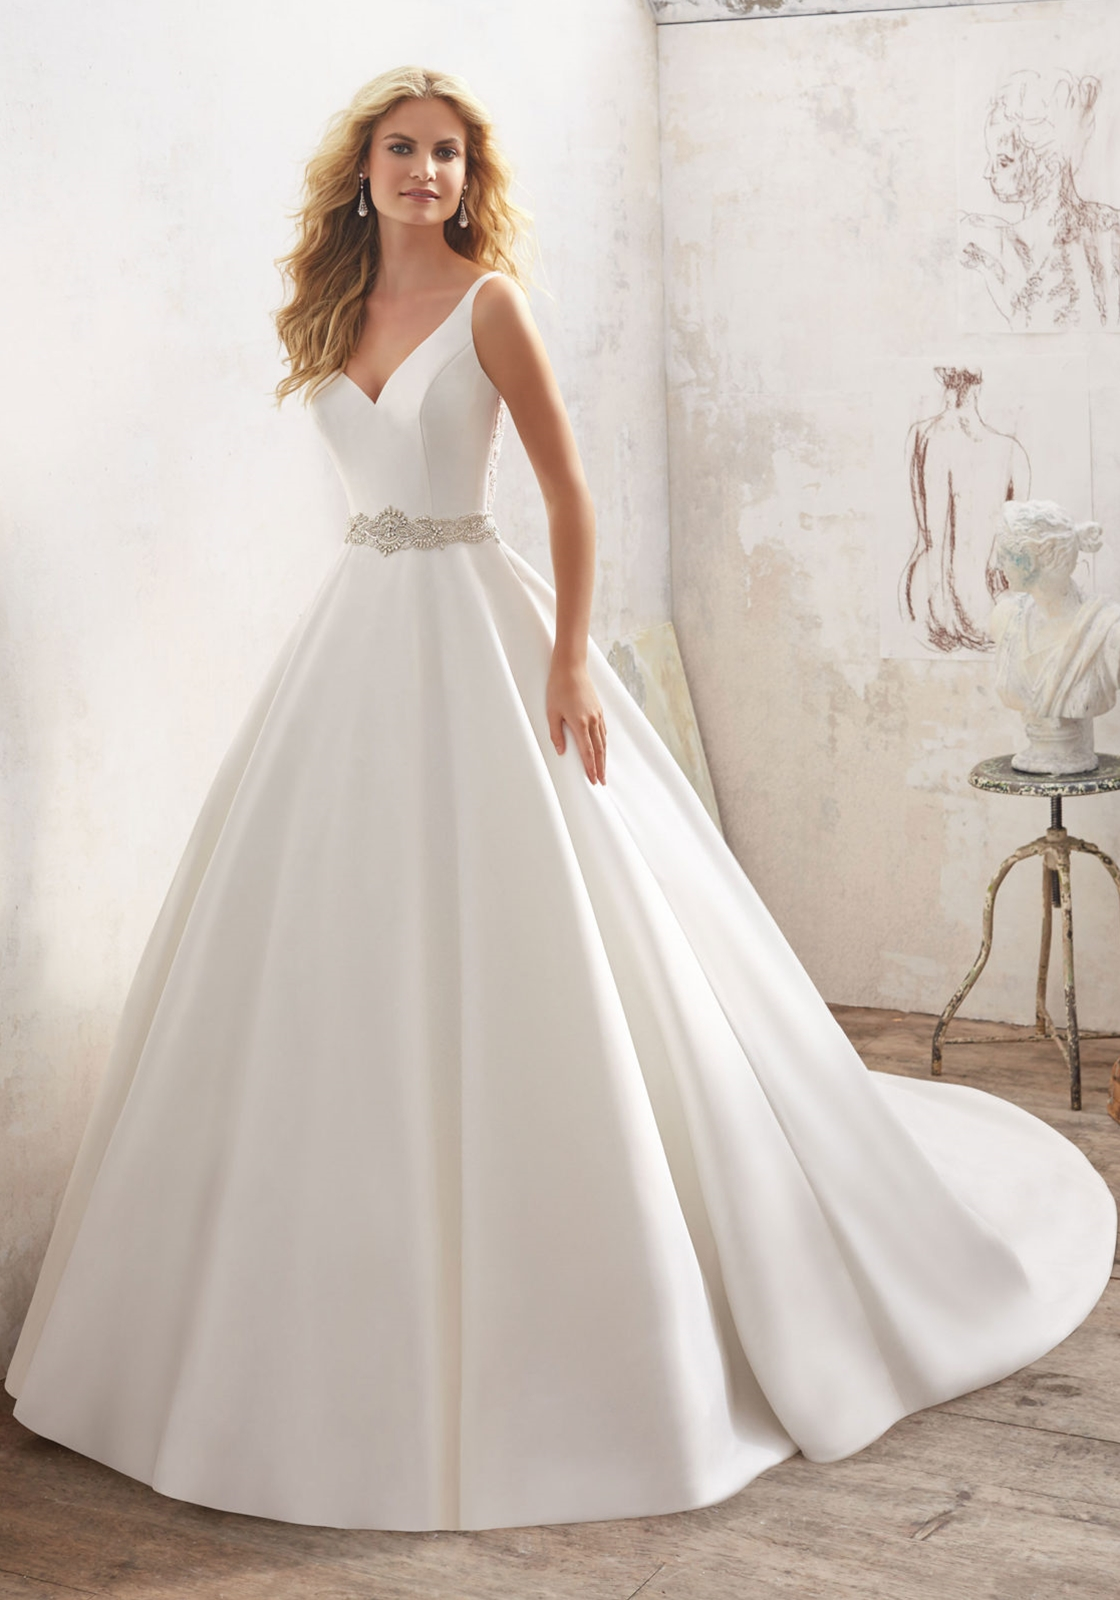 Mori Lee Wedding Dresses Wedding Designer Bridal Gowns